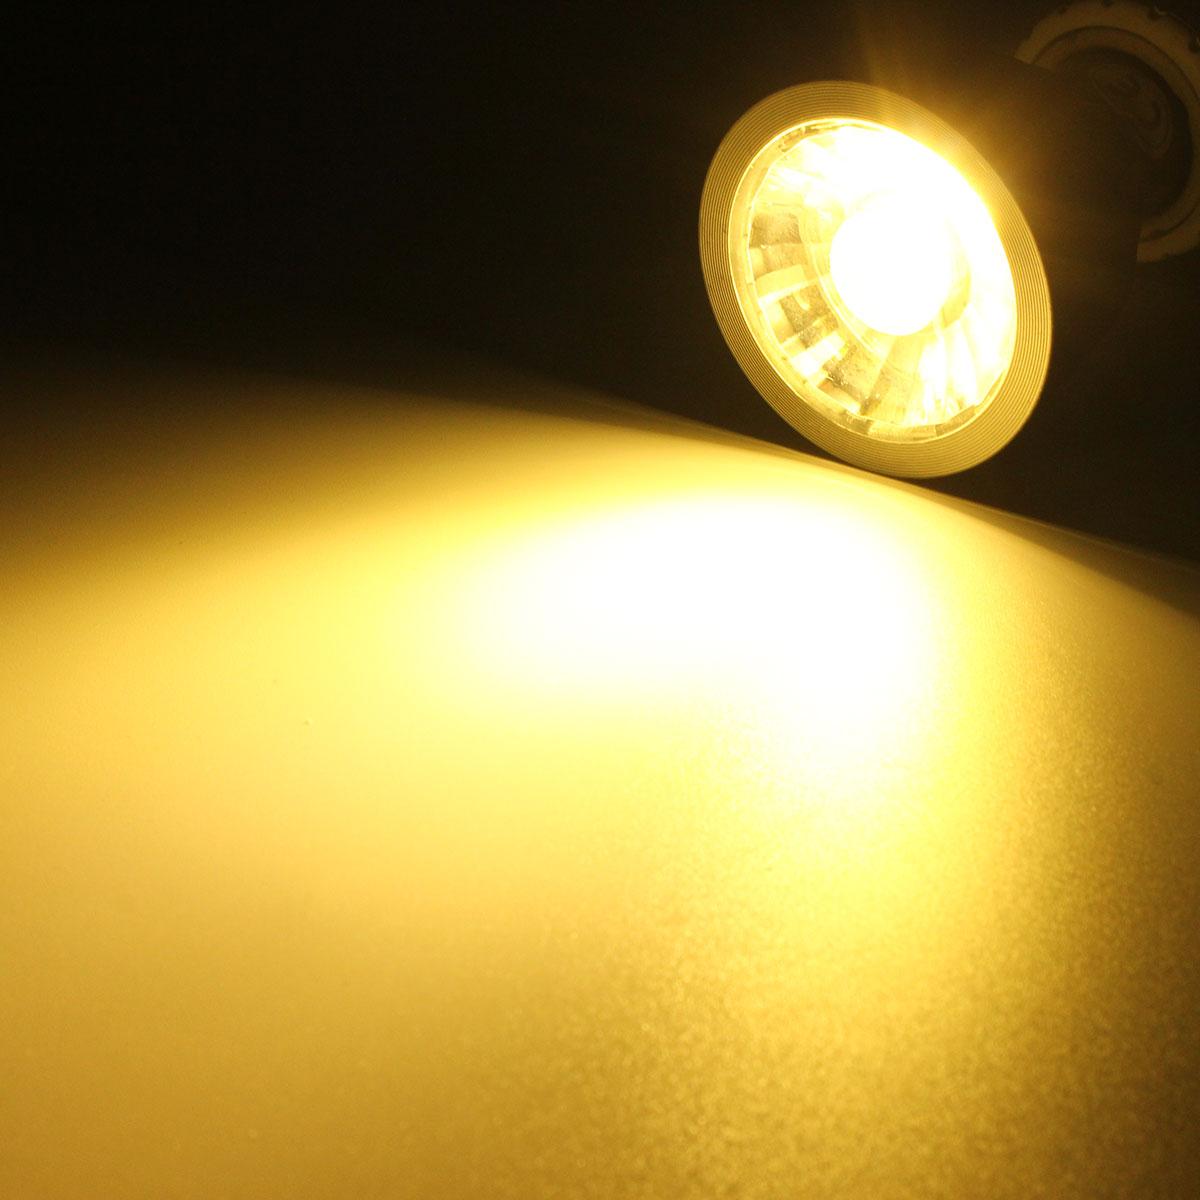 Ultra Bright LED 7W Pure White Warm White Natural White COB LED Spotlight Light Bulb DC12V